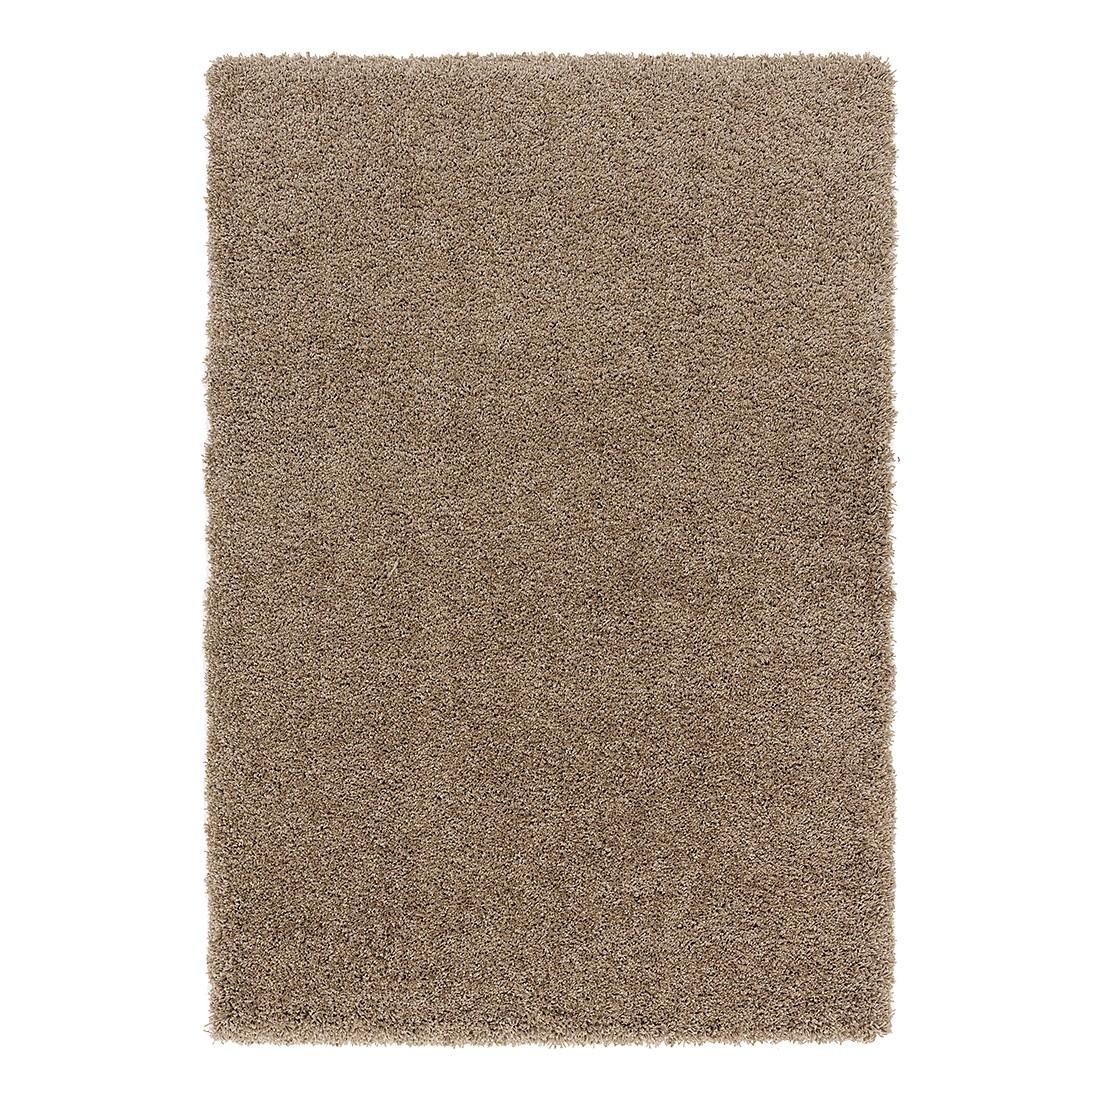 Teppich Como - Beige - 140 x 200 cm, Astra